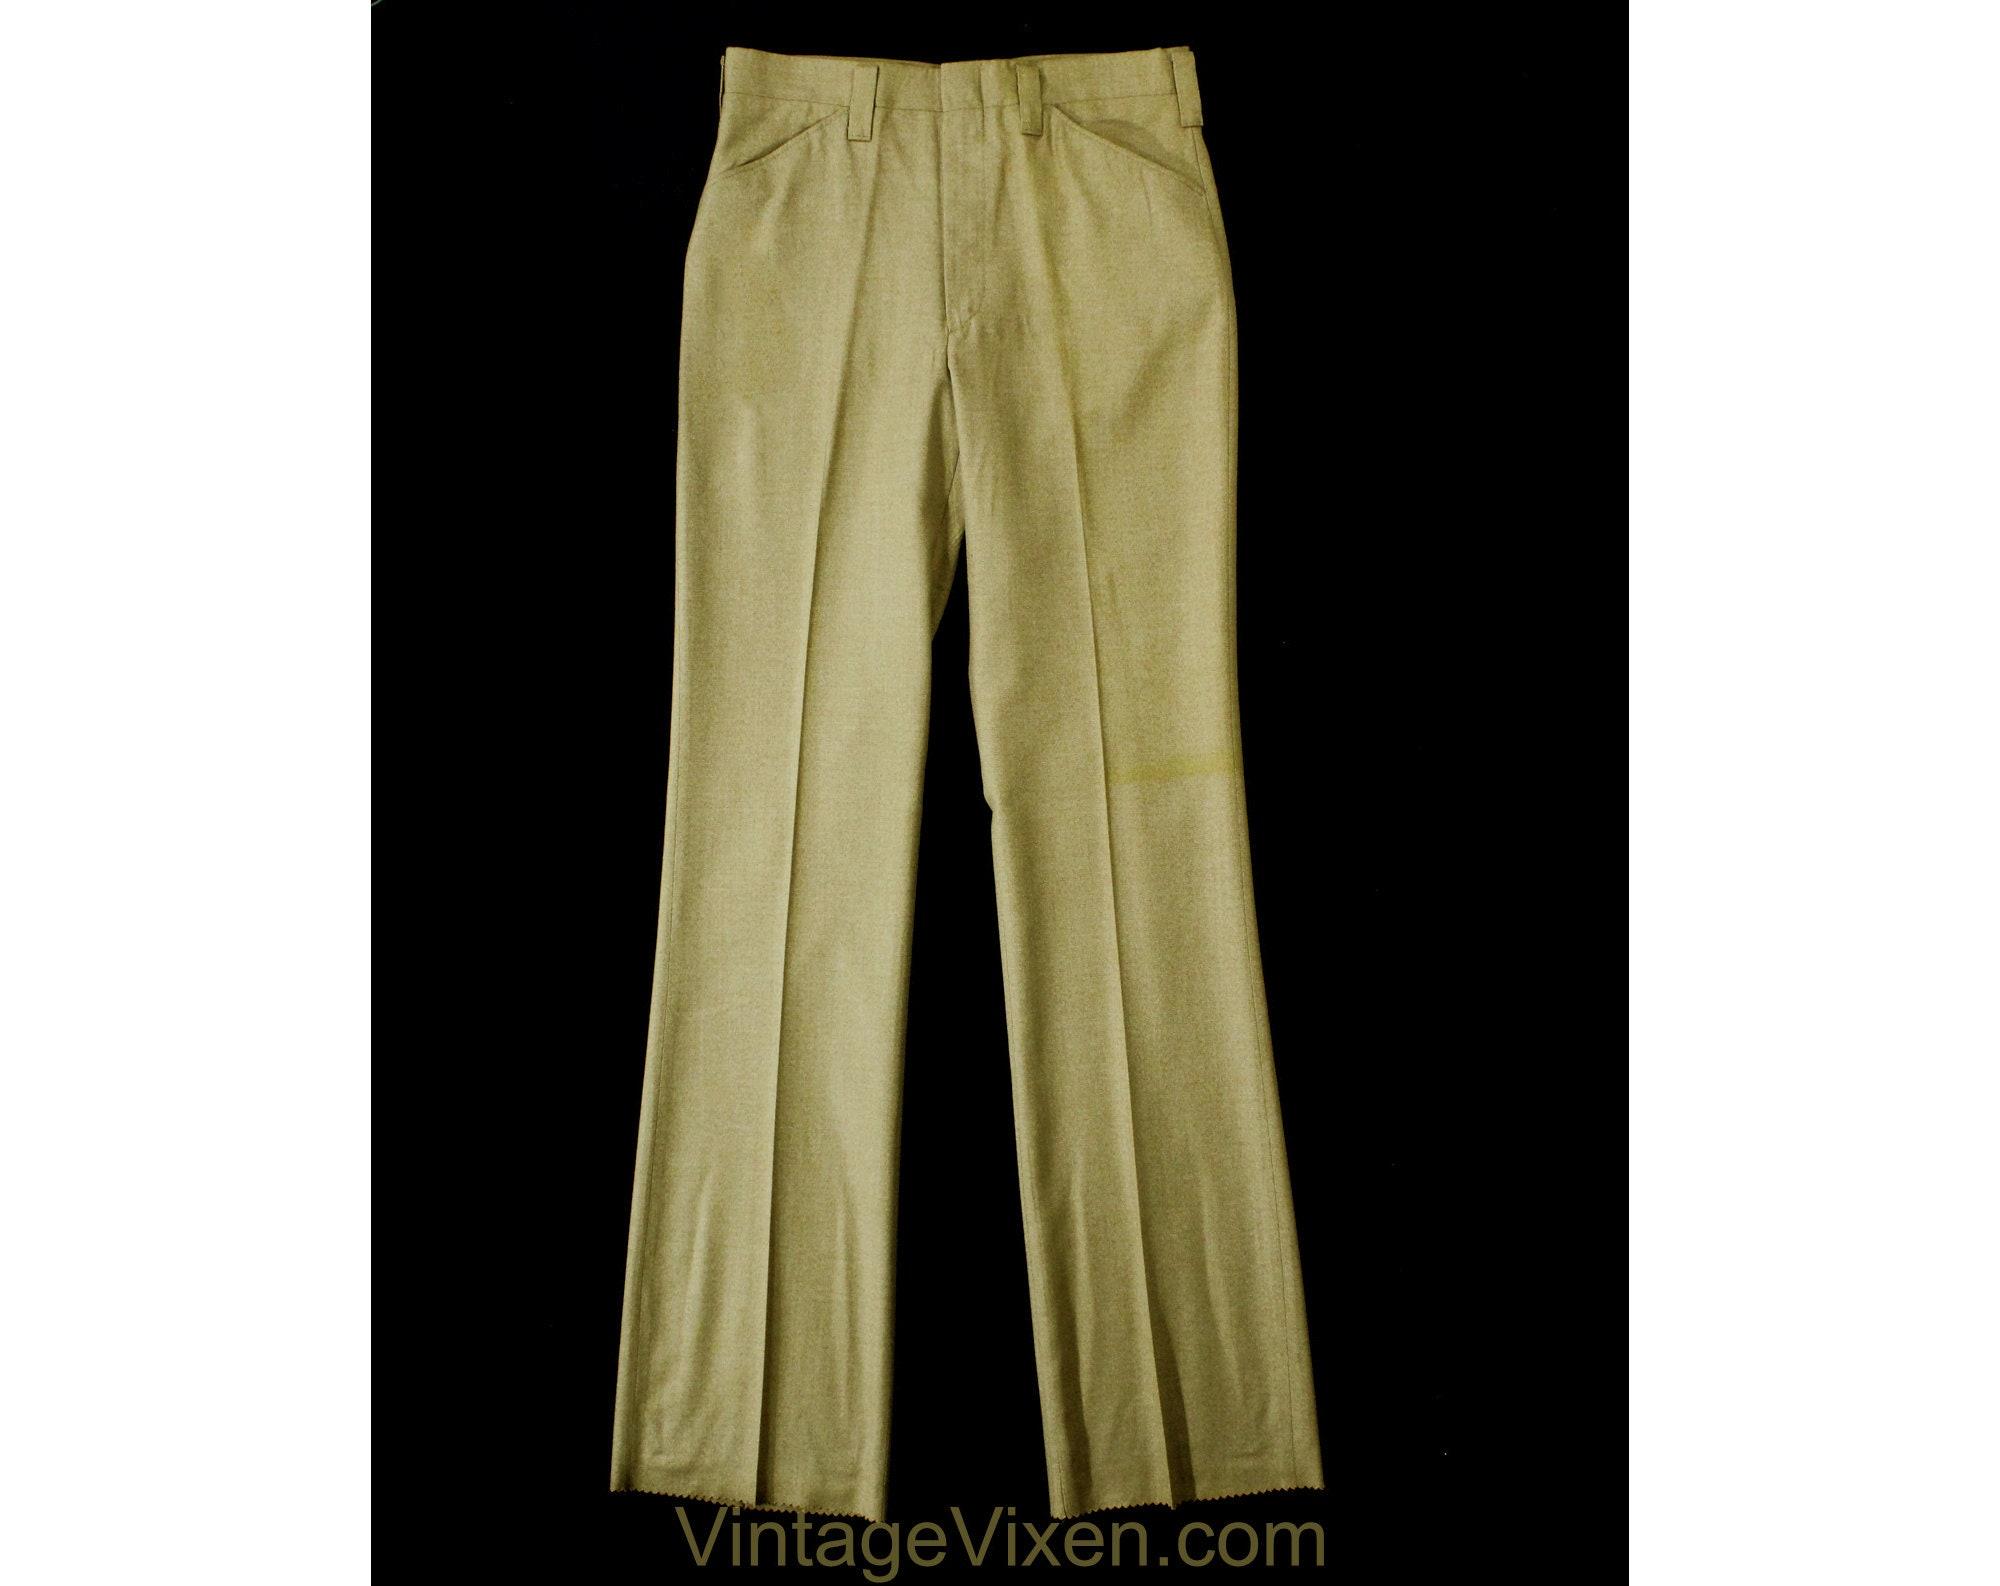 1960s – 70s Men's Ties | Skinny Ties, Slim Ties Mens Medium 60S Pants - Mod Late 1960S Khaki Brown Tailored Pant Boot Cut Flare Trouser Handsome Deadstock Waist 32 Inseam 38 $69.99 AT vintagedancer.com